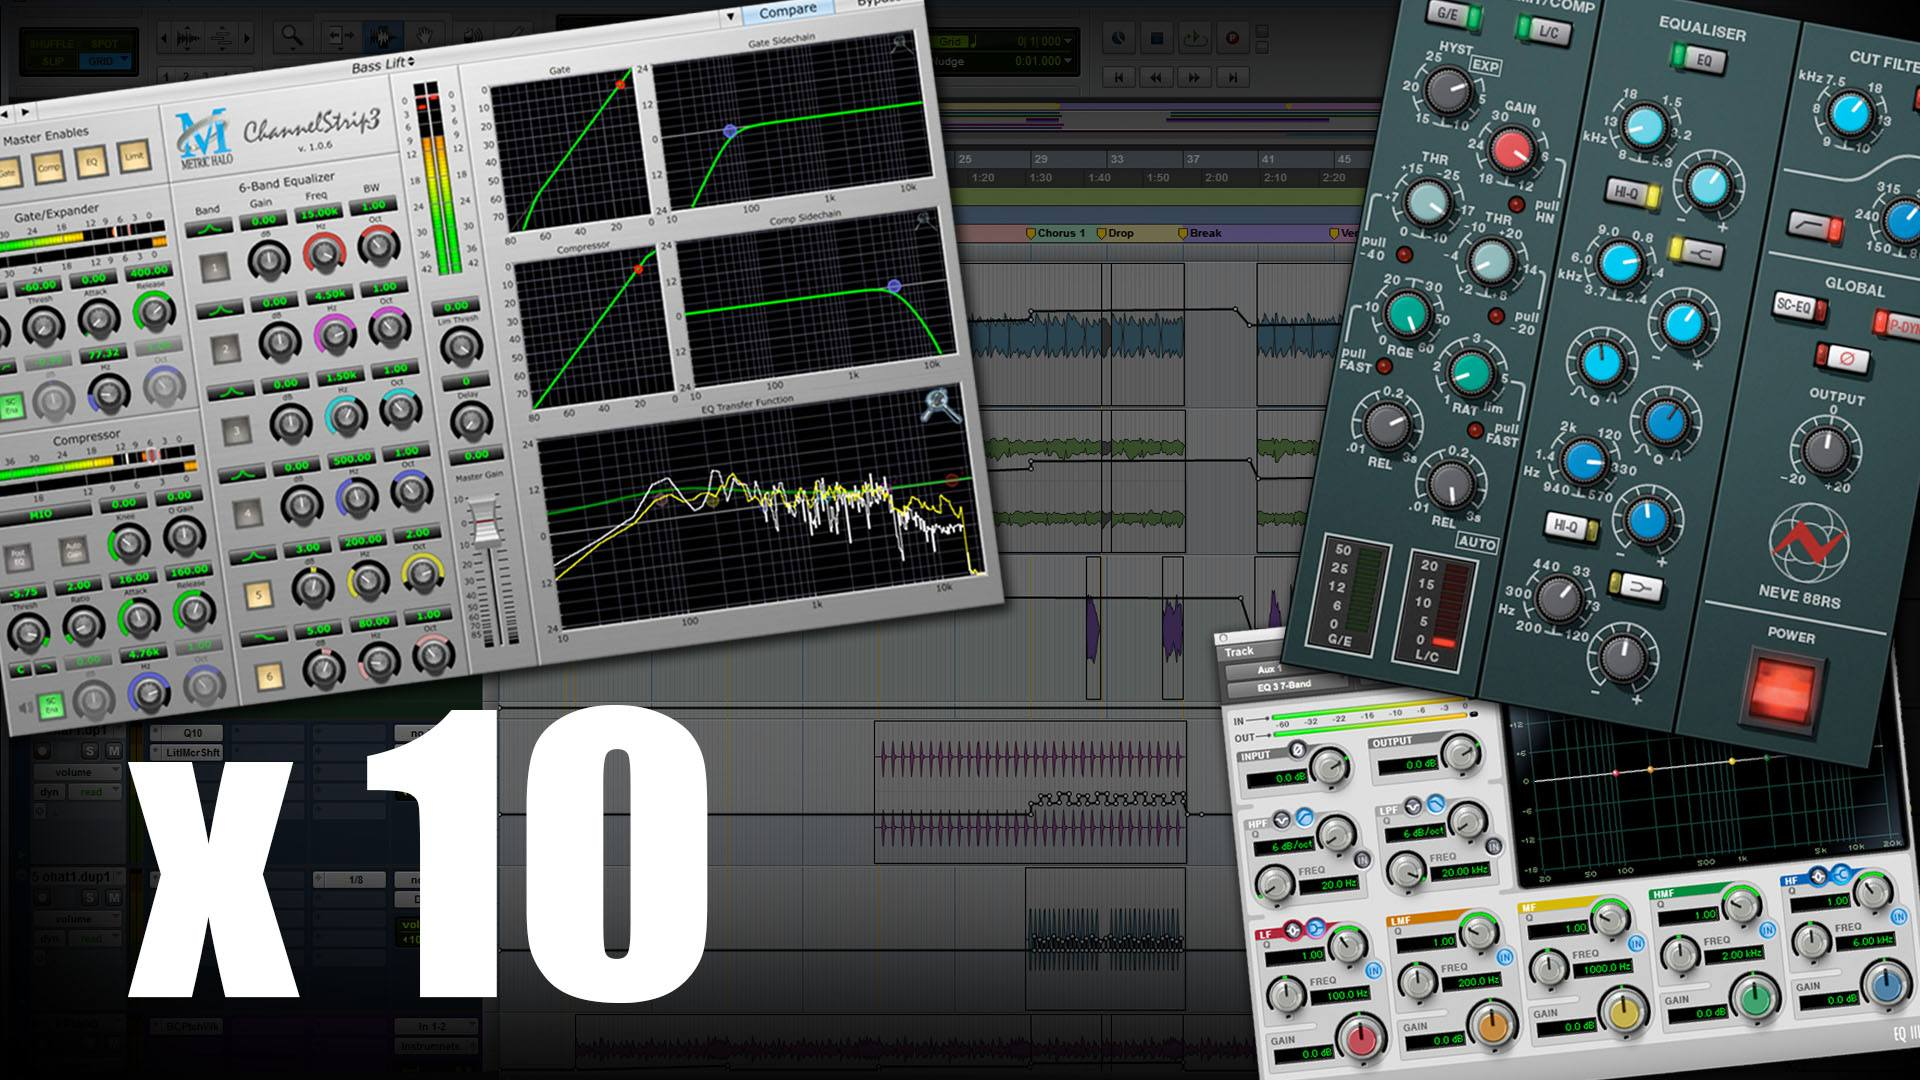 10 Pro Fav EQs-1